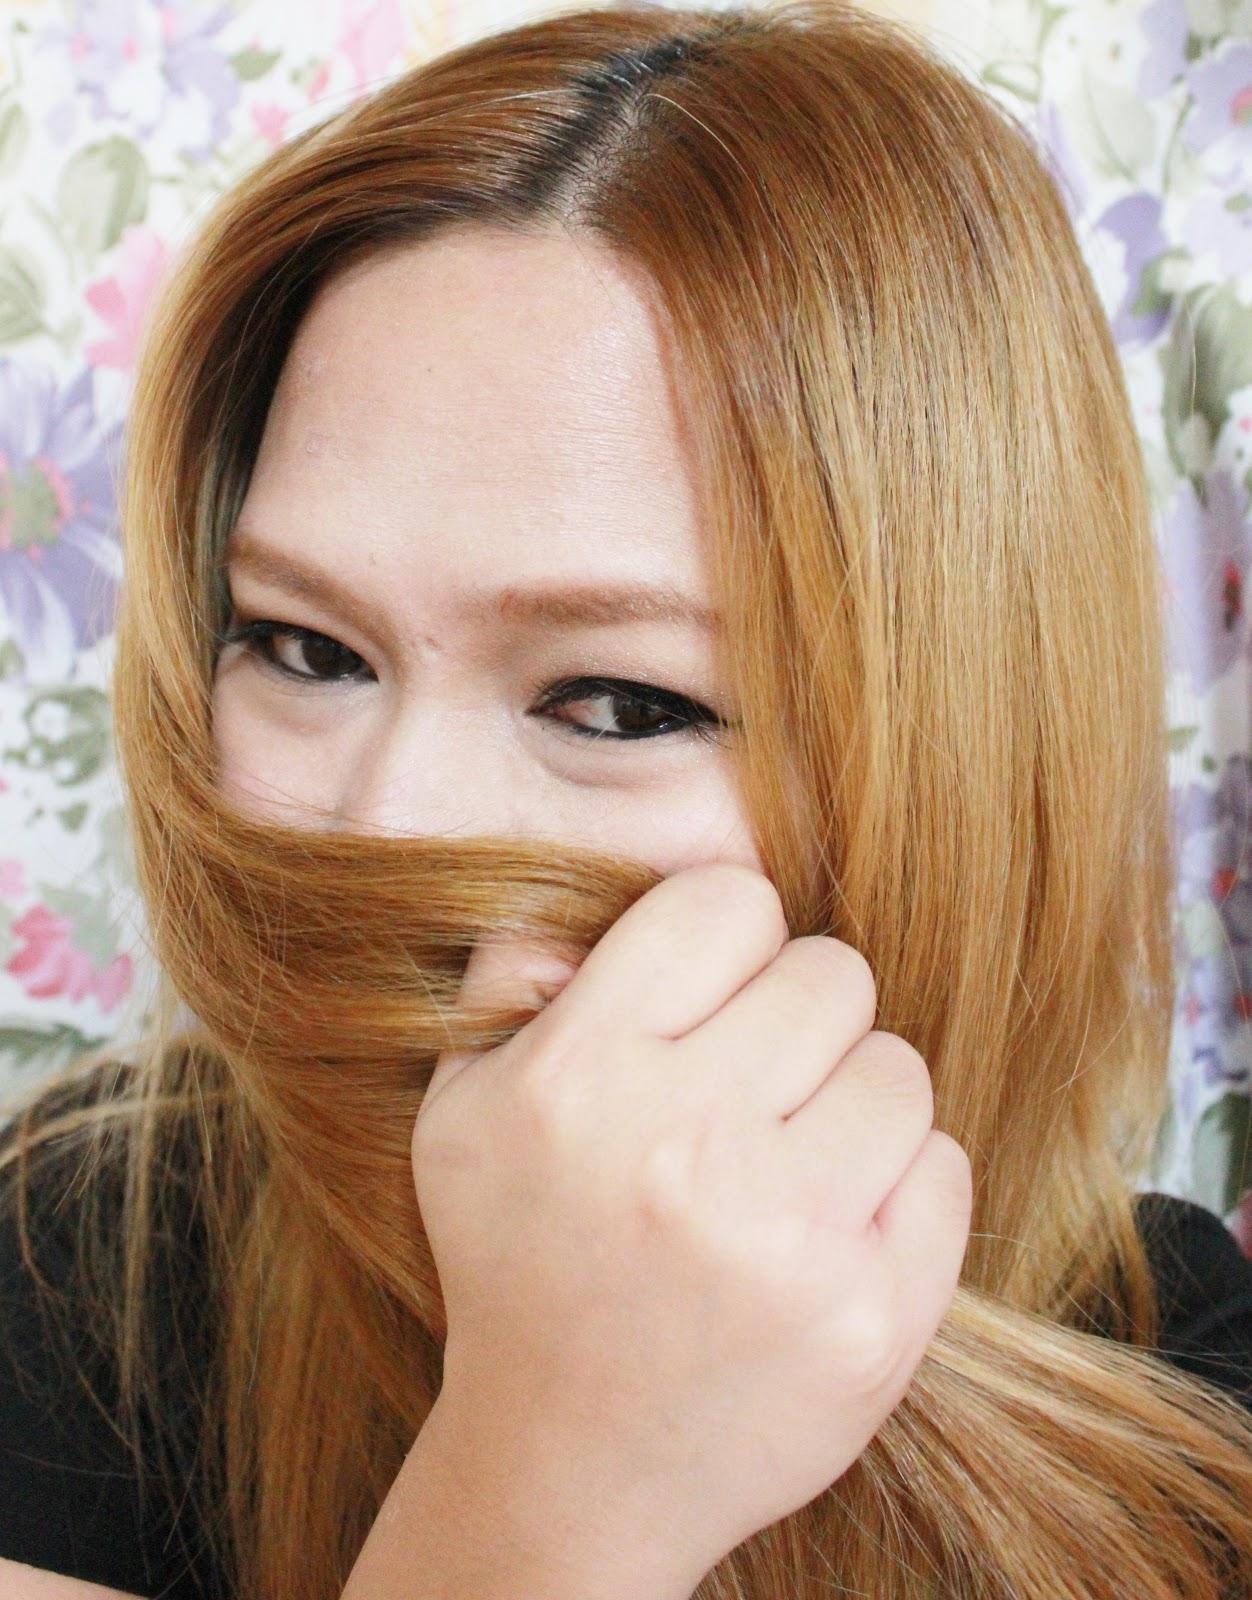 Hikari Hajimari Palty Hair Dye In Custard Beige Review